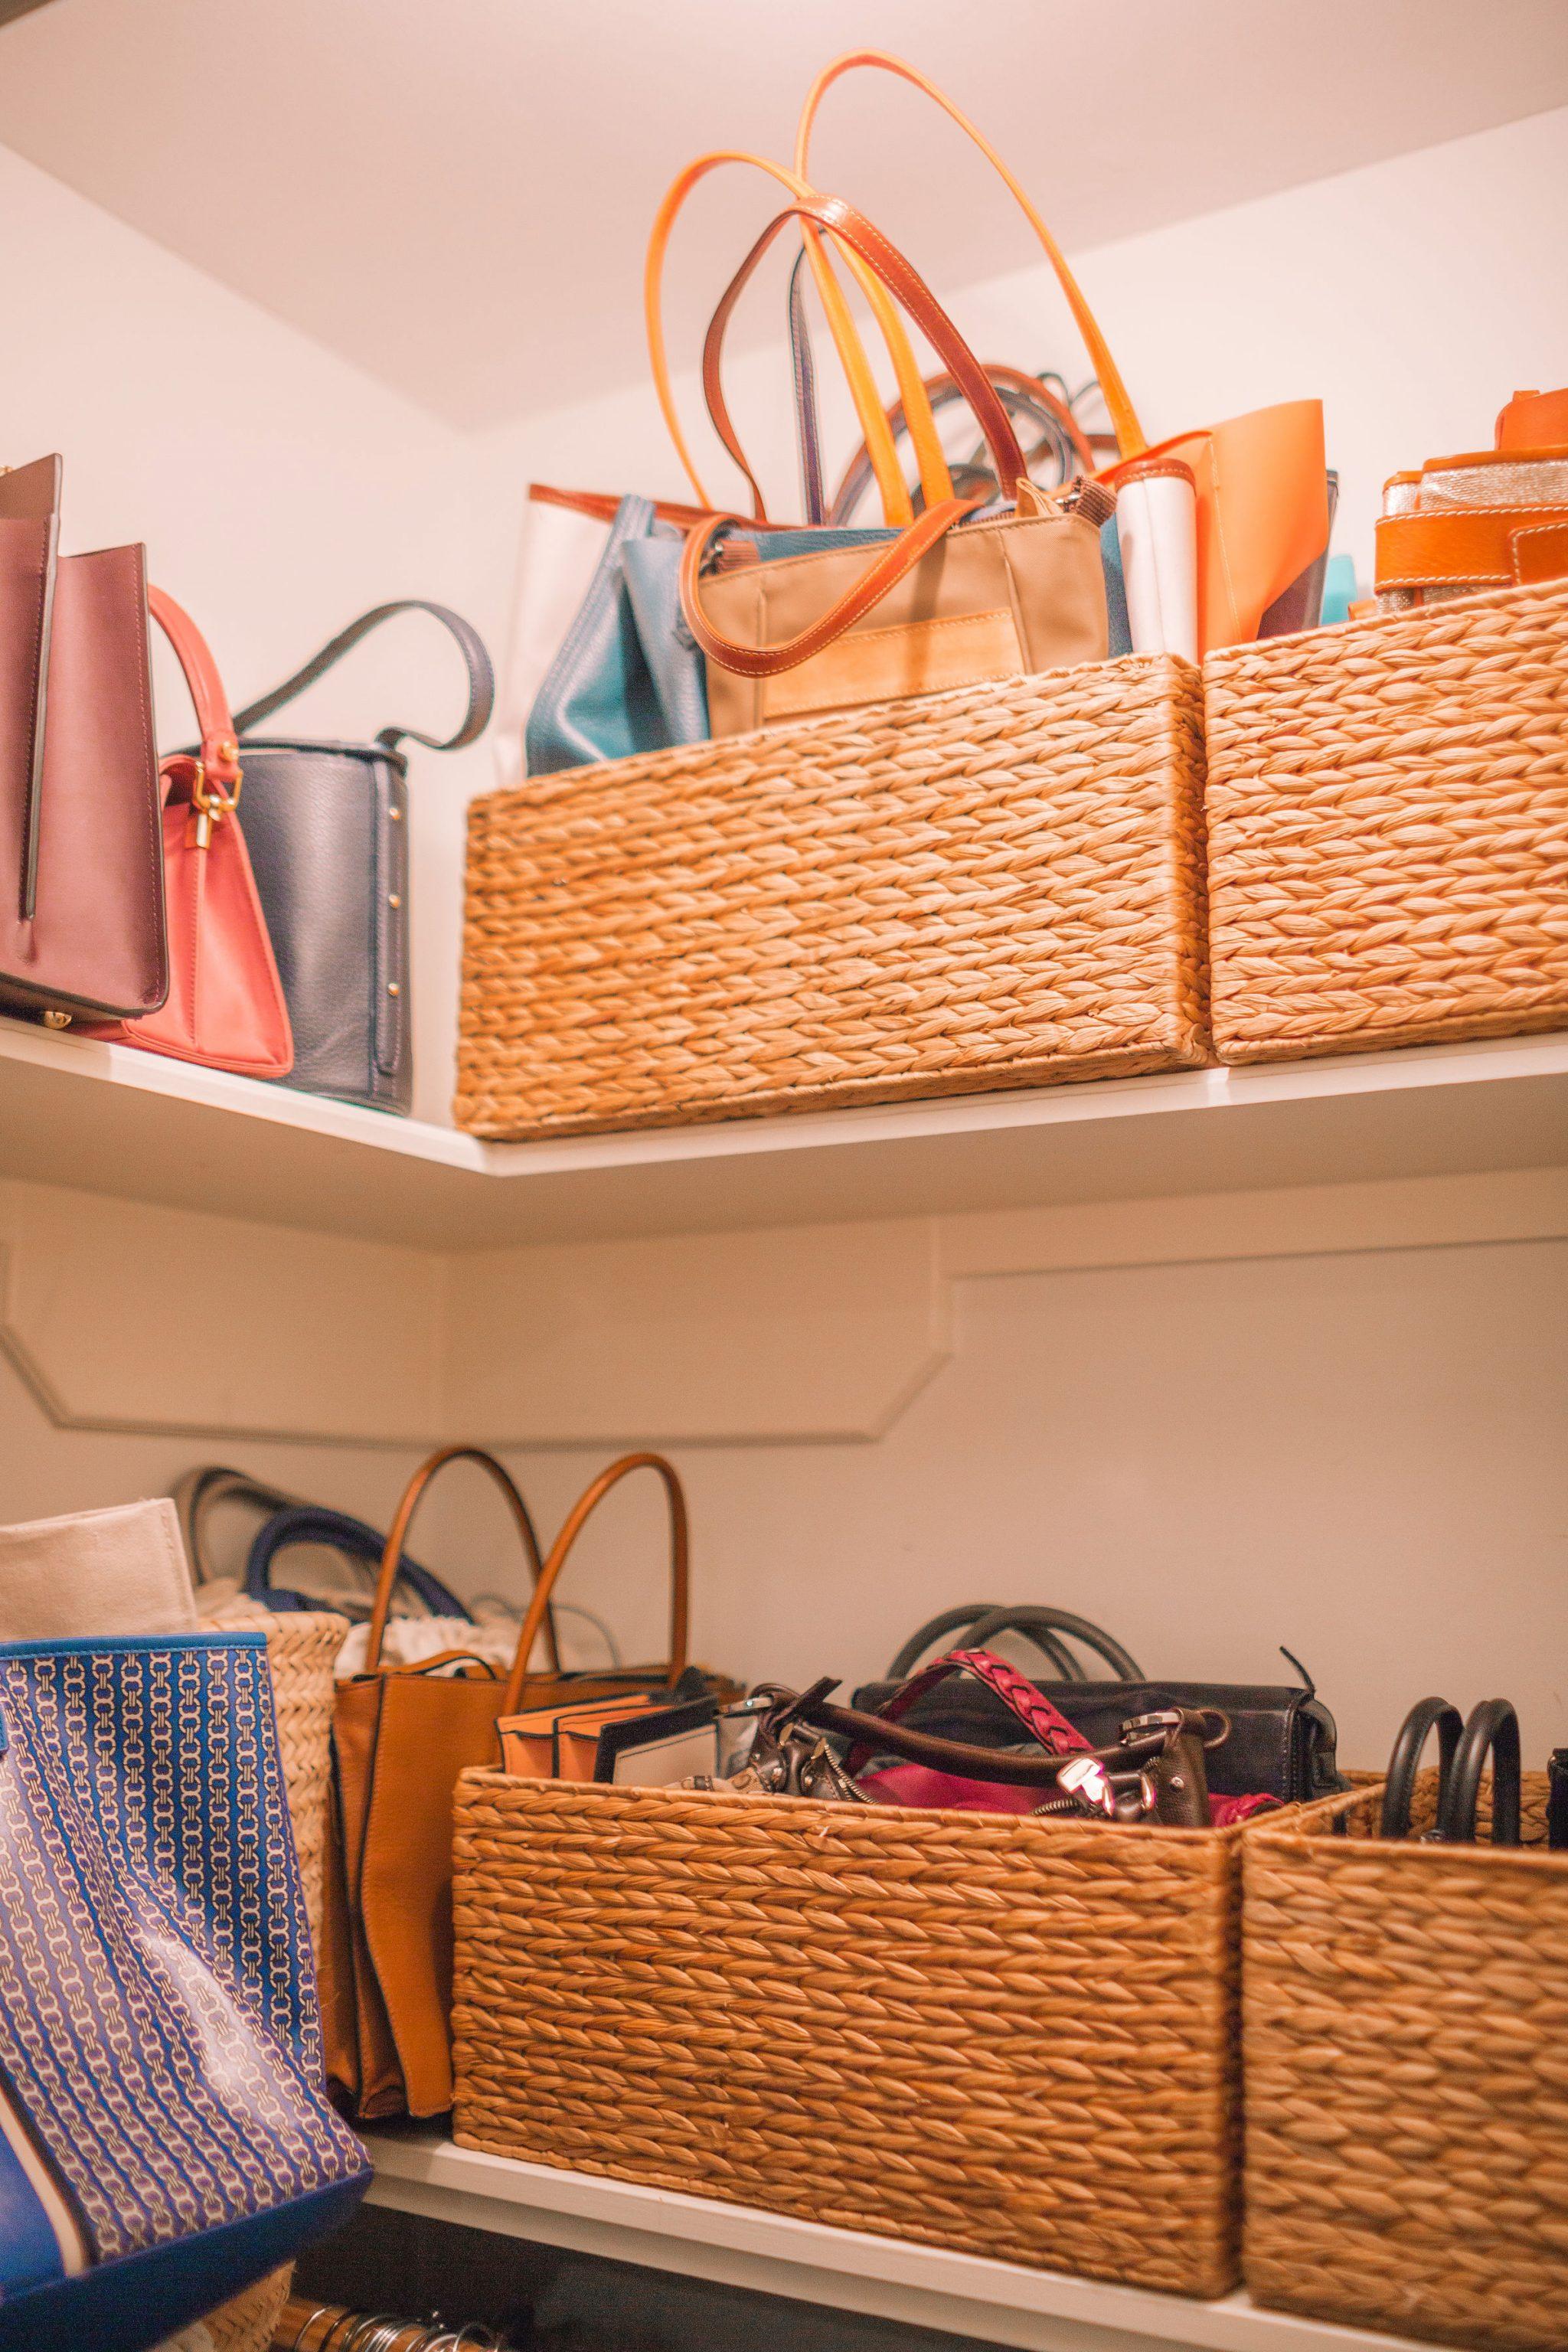 Jute baskets for handbag organization